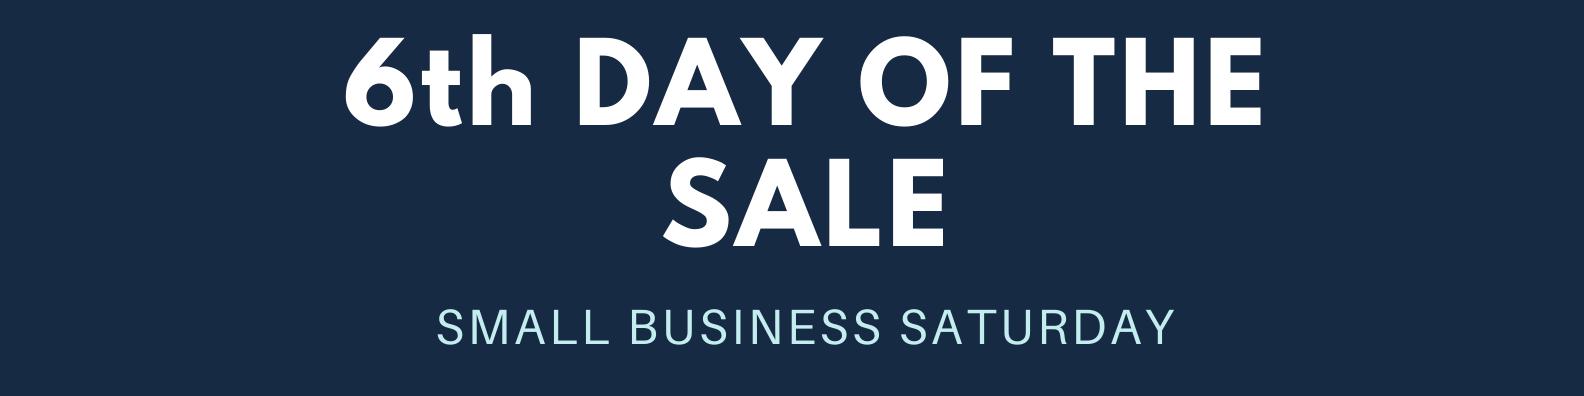 2021 Black Friday Marketing Strategy Small Business Saturday